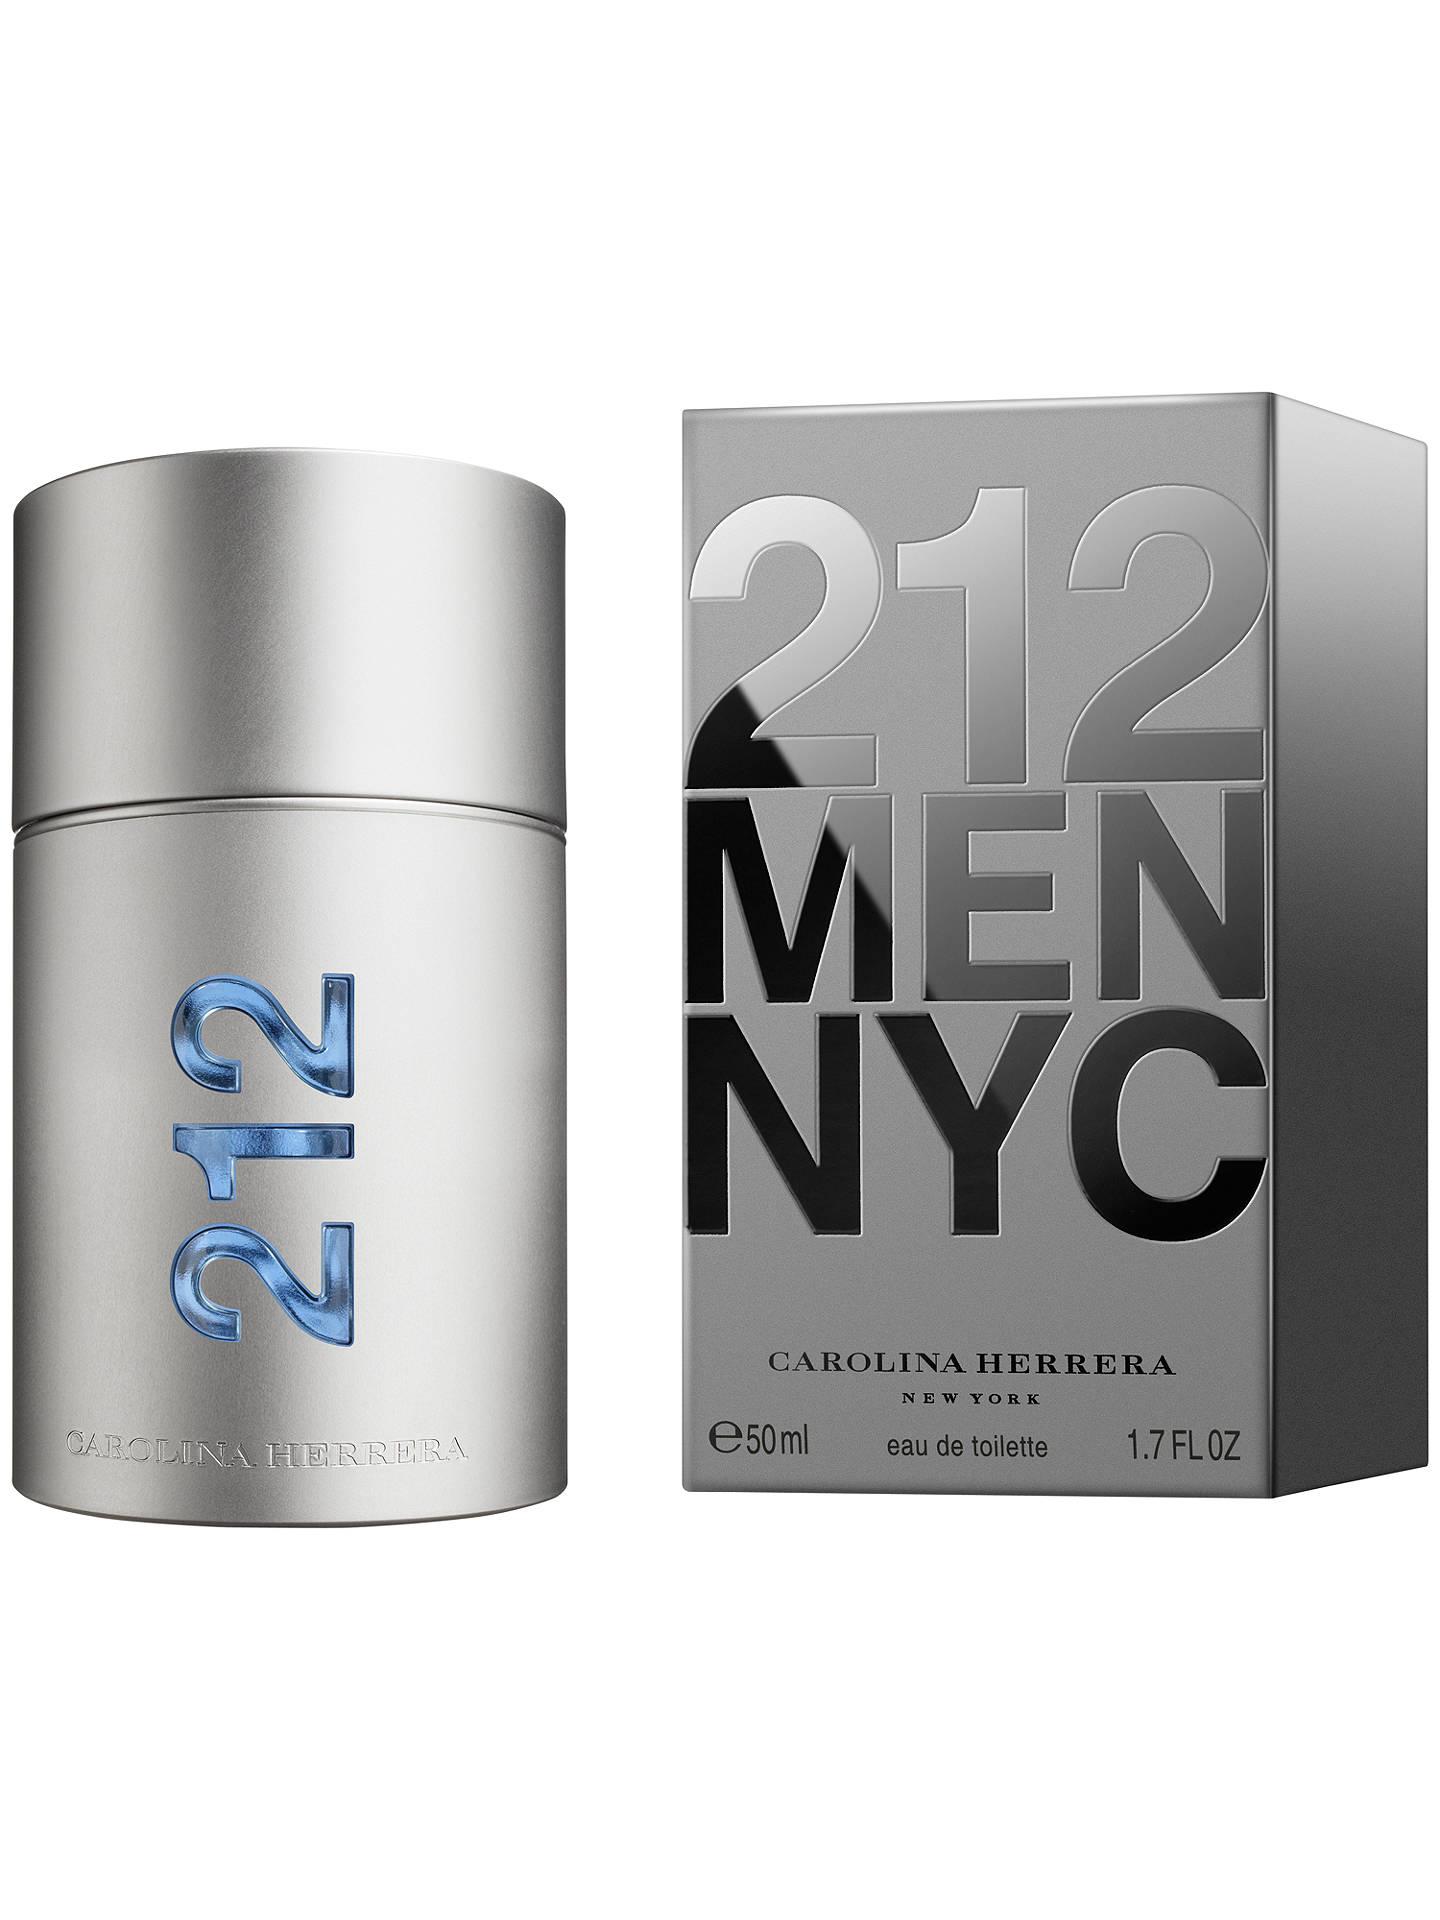 a4f6d44407 Buy Carolina Herrera 212 Men Eau de Toilette Spray, 100ml Online at  johnlewis.com